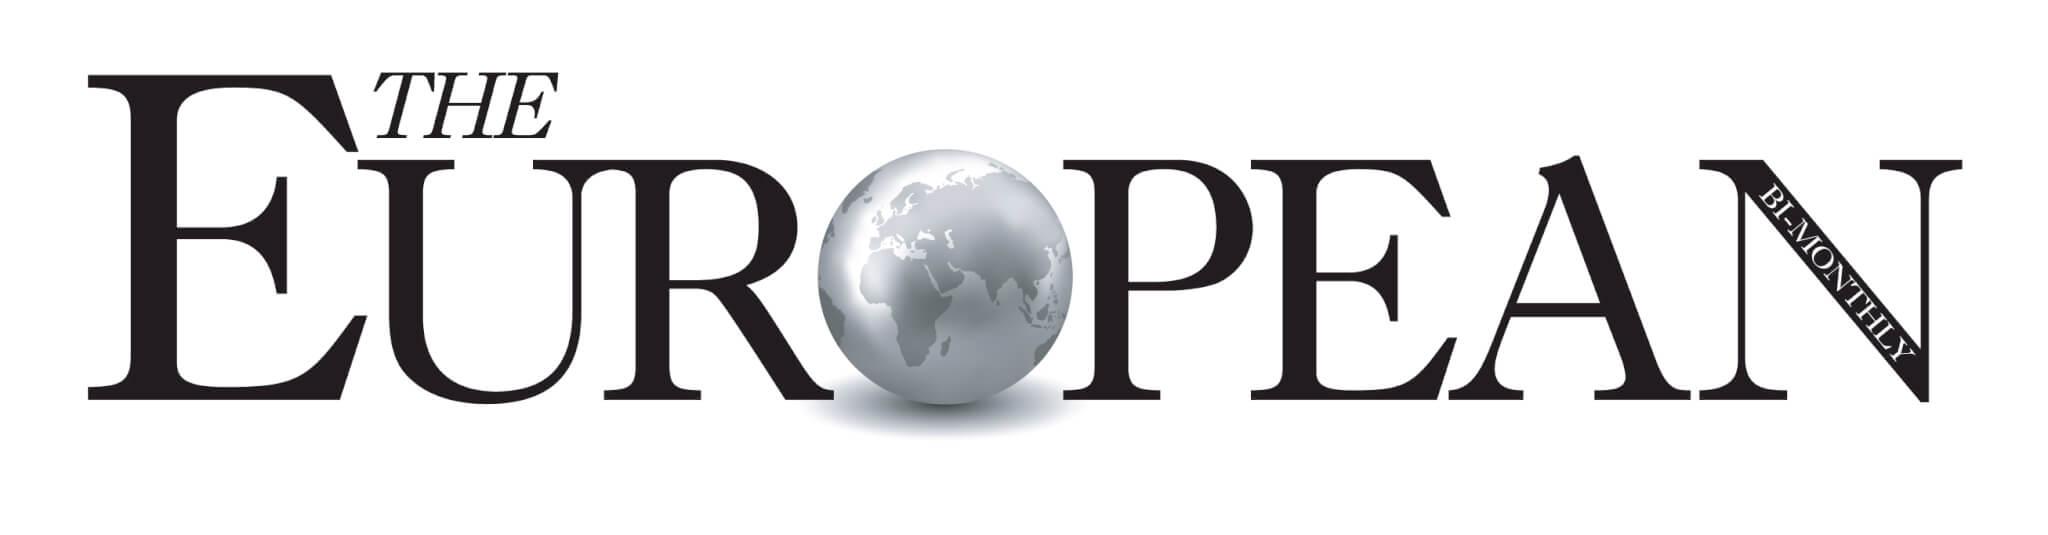 theeuropeanlogo